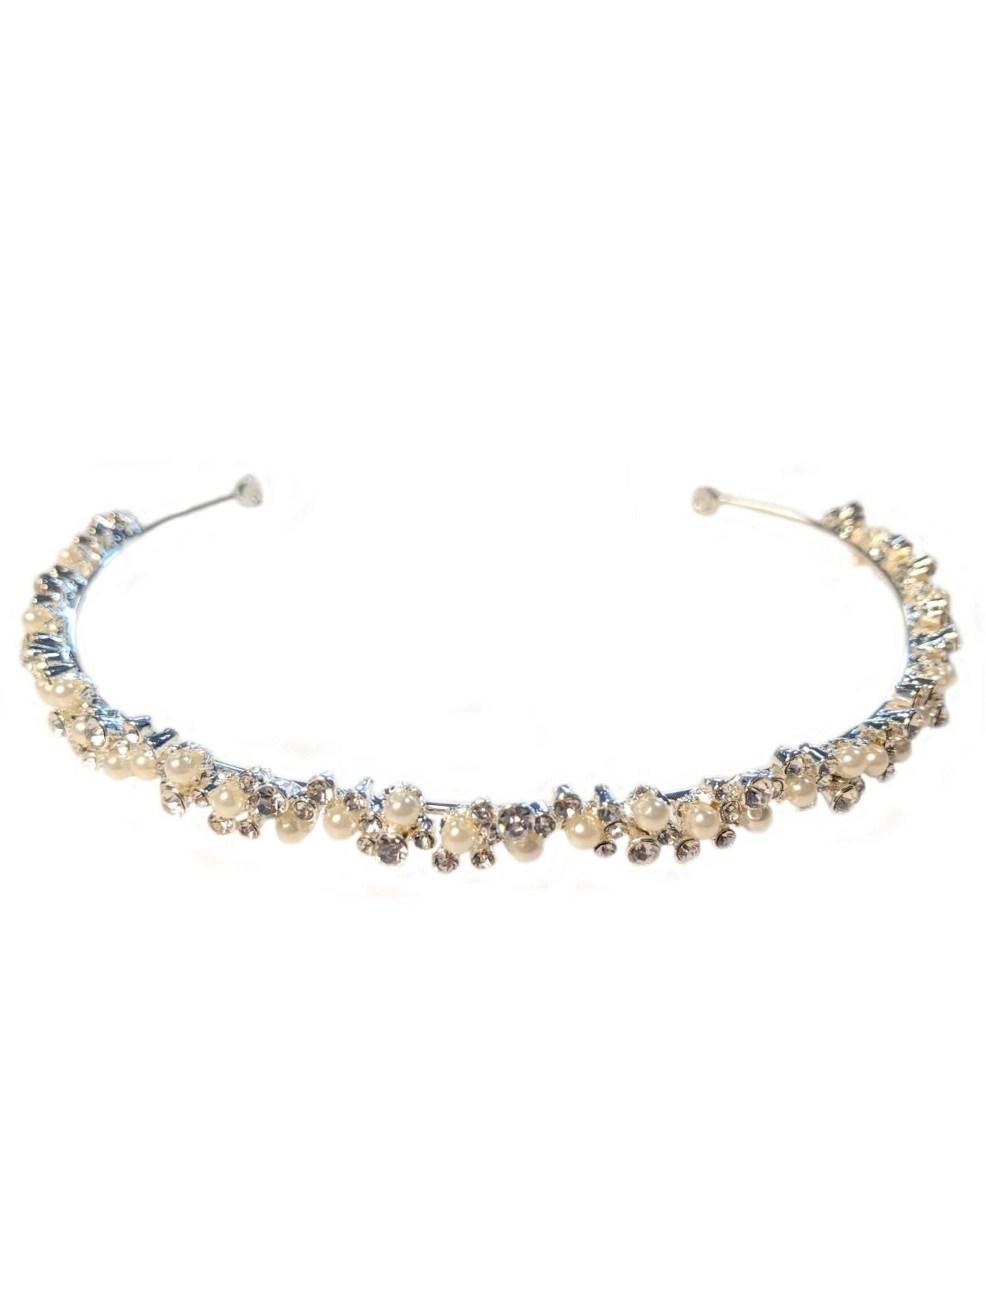 lt656 wedding hair accessories headband with pearls